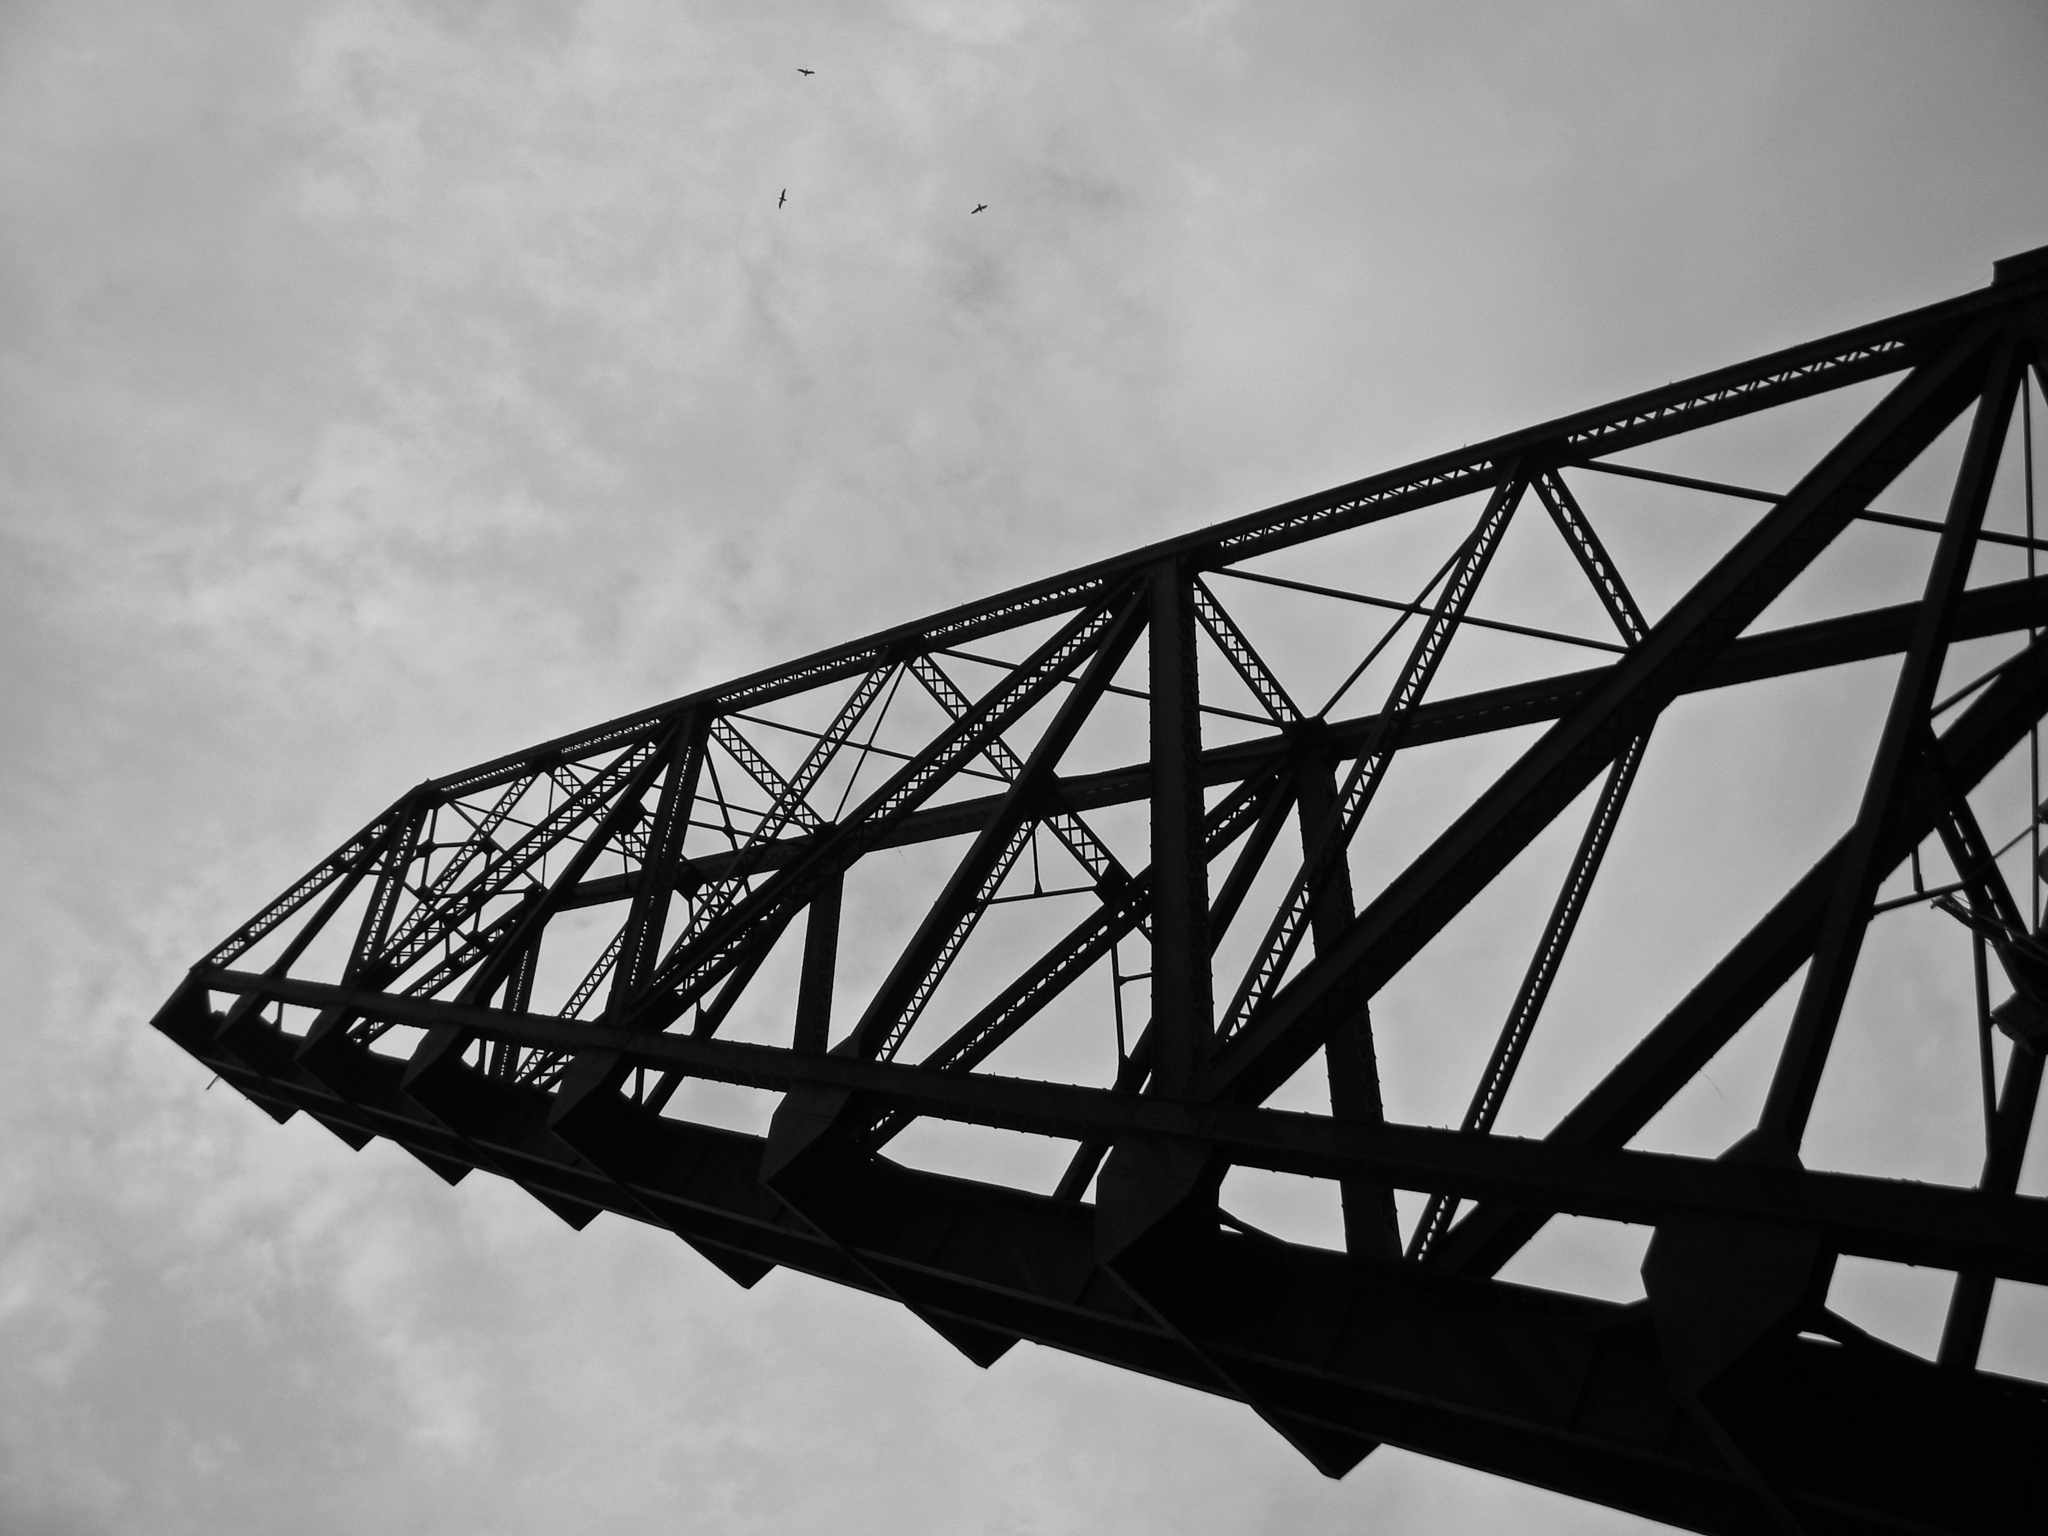 Railroad Bridge by Phillip W. Strunk